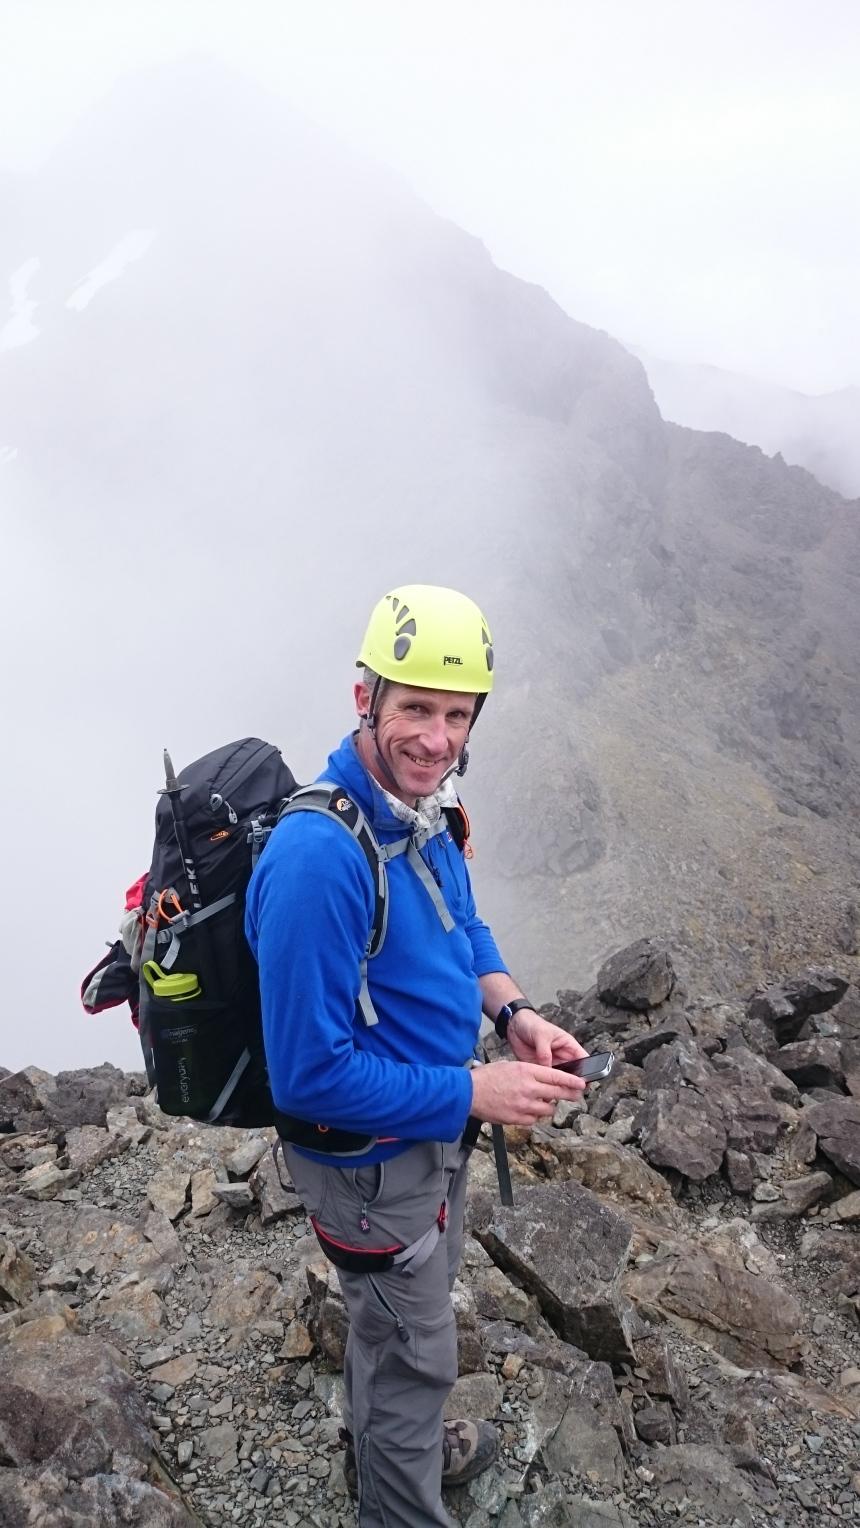 Ian enjoying his first outing on the Cuillin Ridge